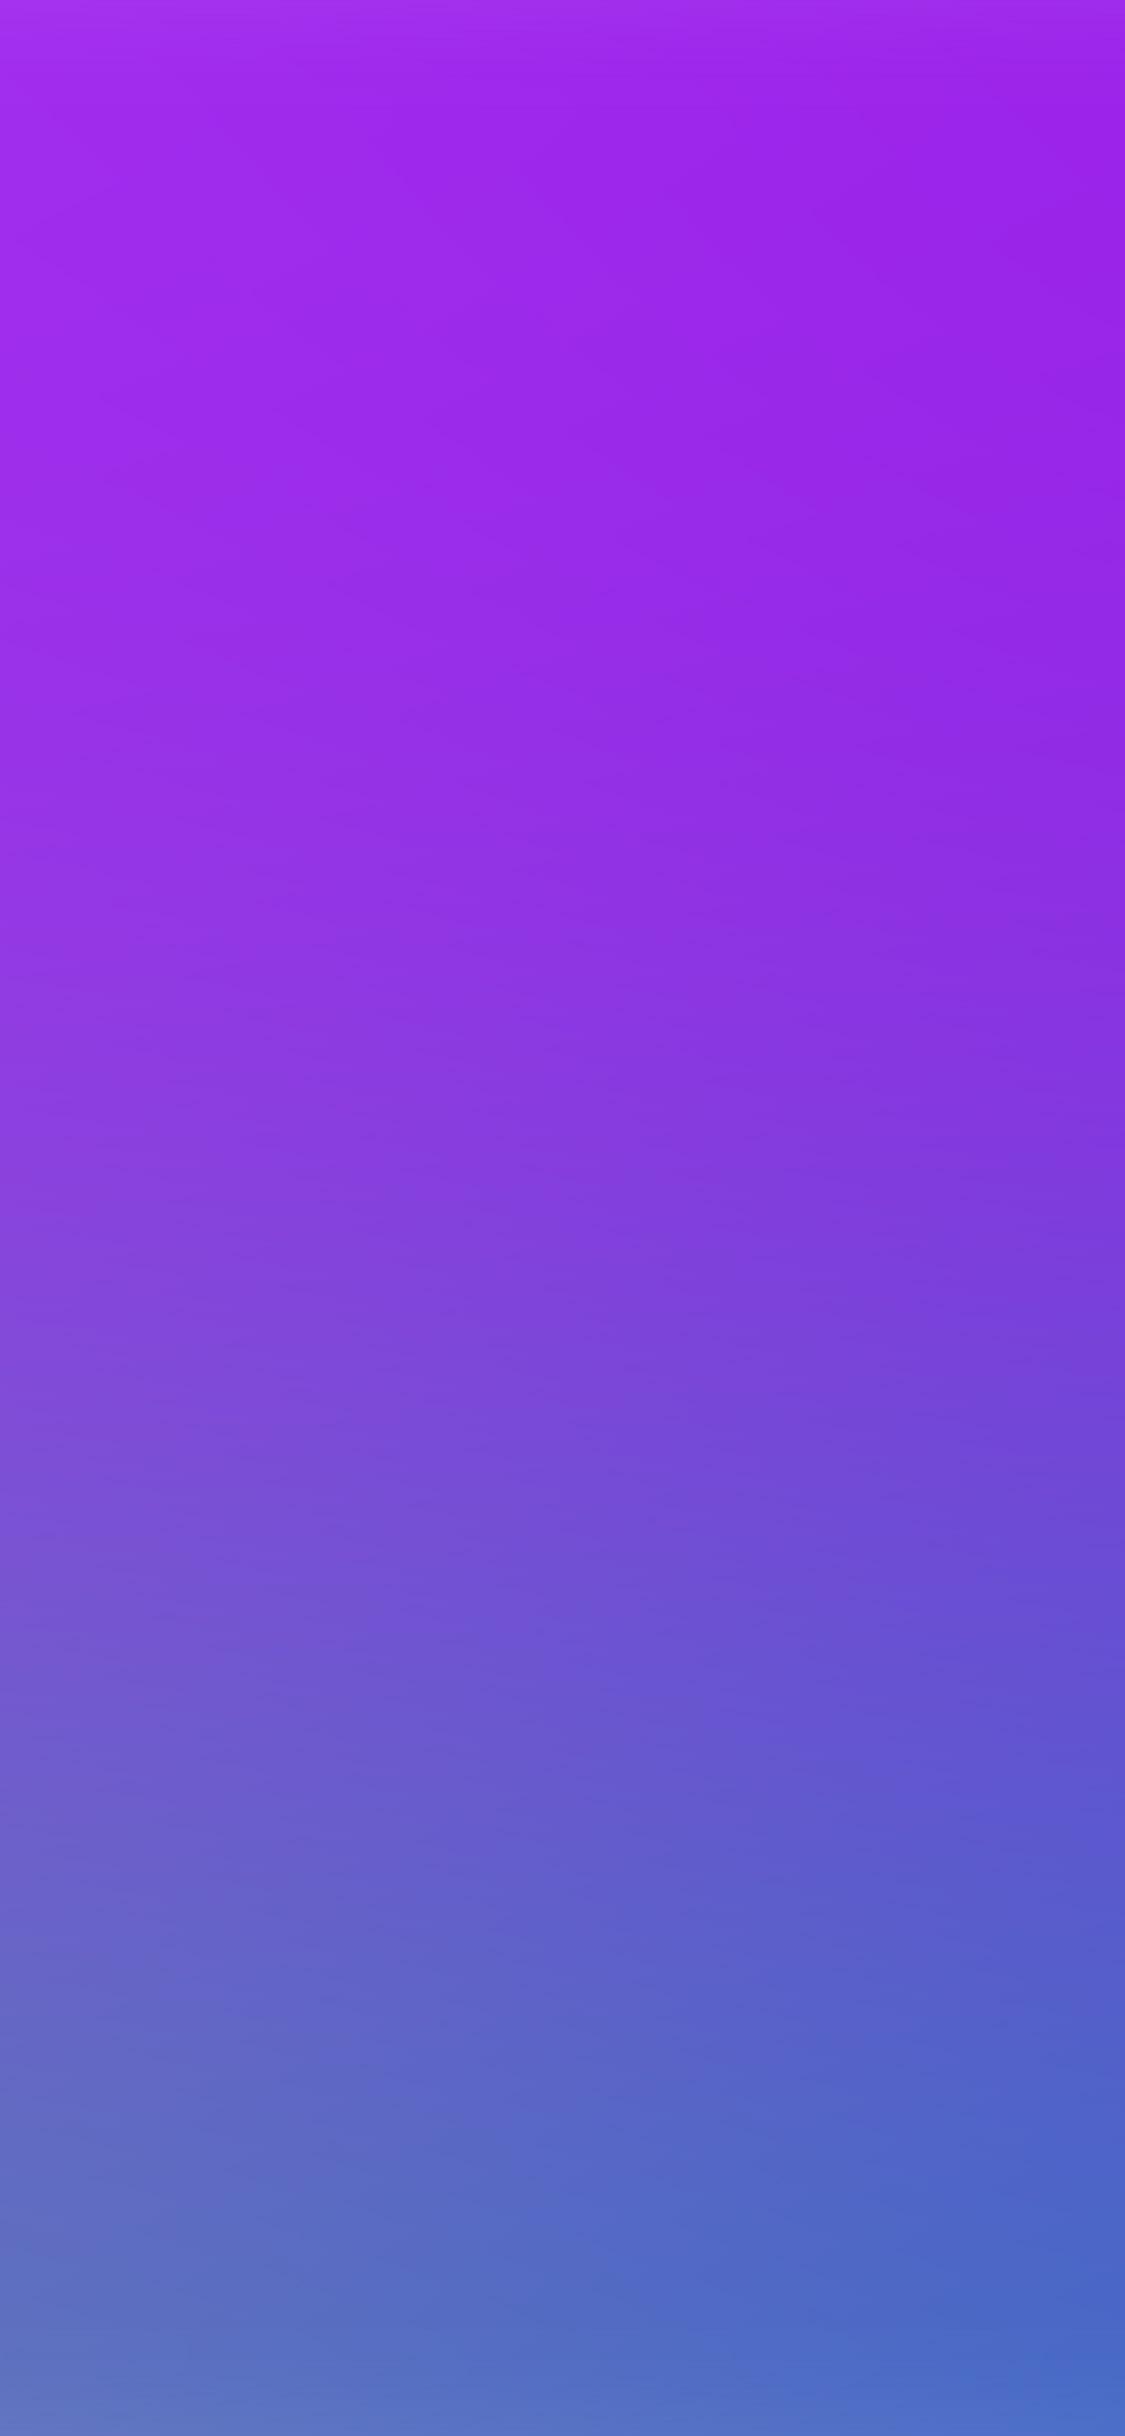 iPhonexpapers.com-Apple-iPhone-wallpaper-sm09-purple-blue-blur-gradation